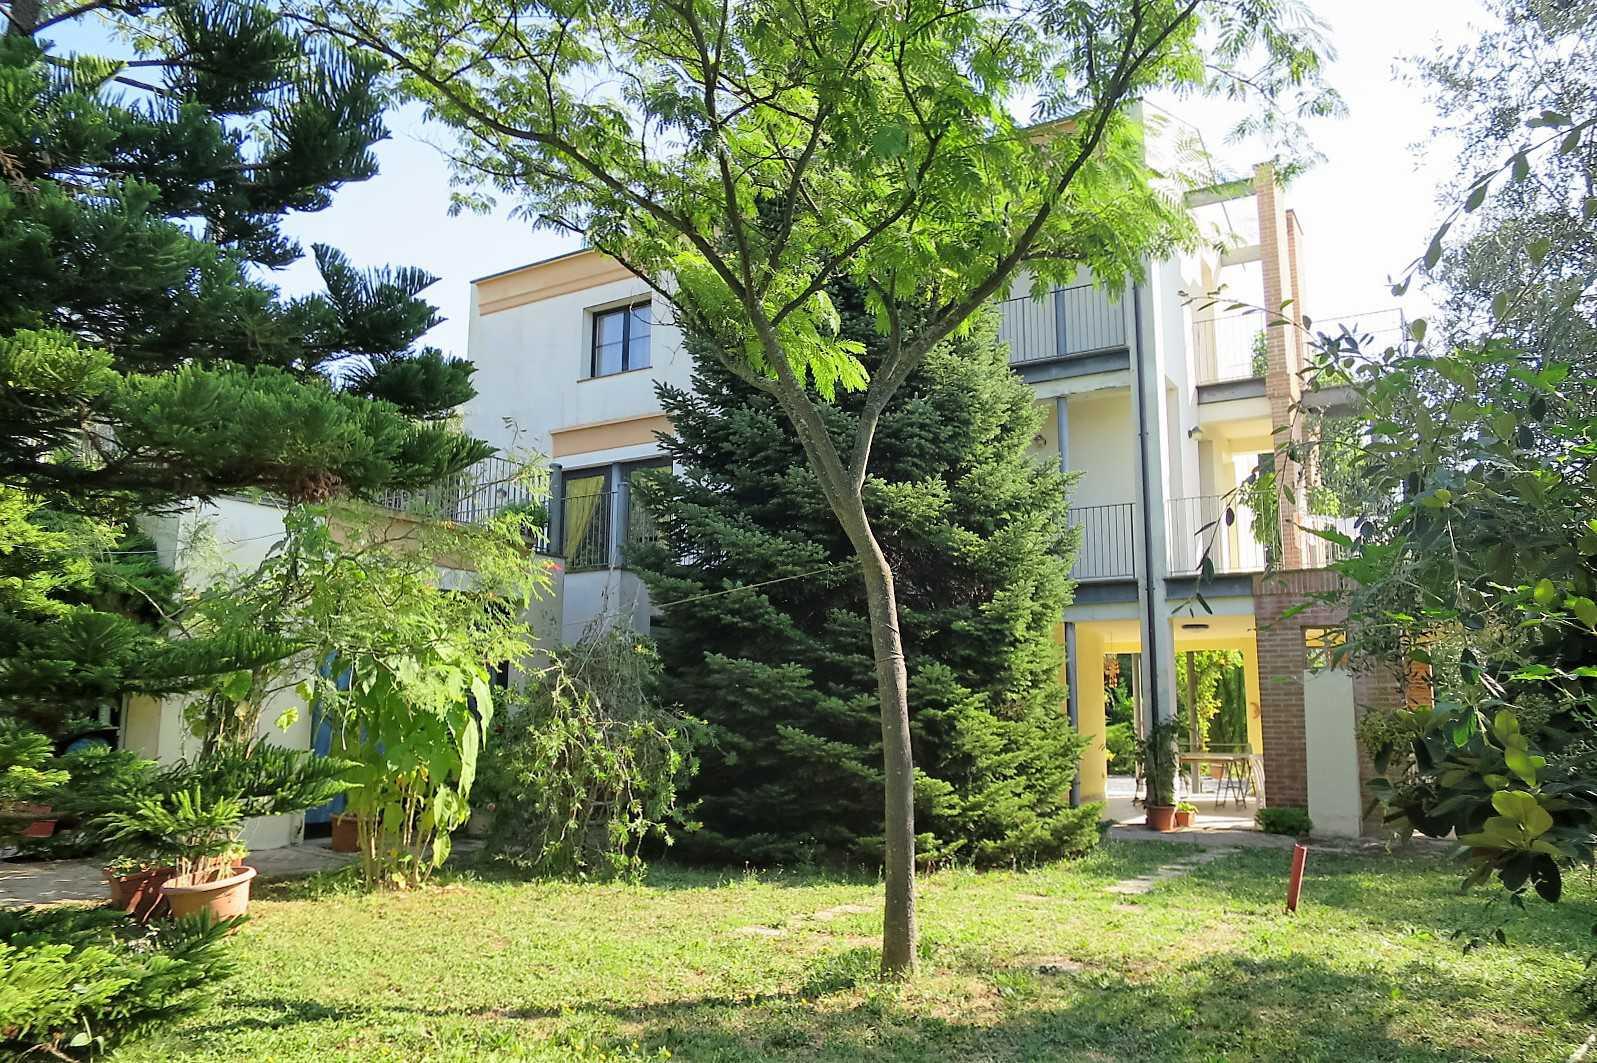 Villa Villa in vendita Atri (TE), Villa Paola - Atri - EUR 471.071 90